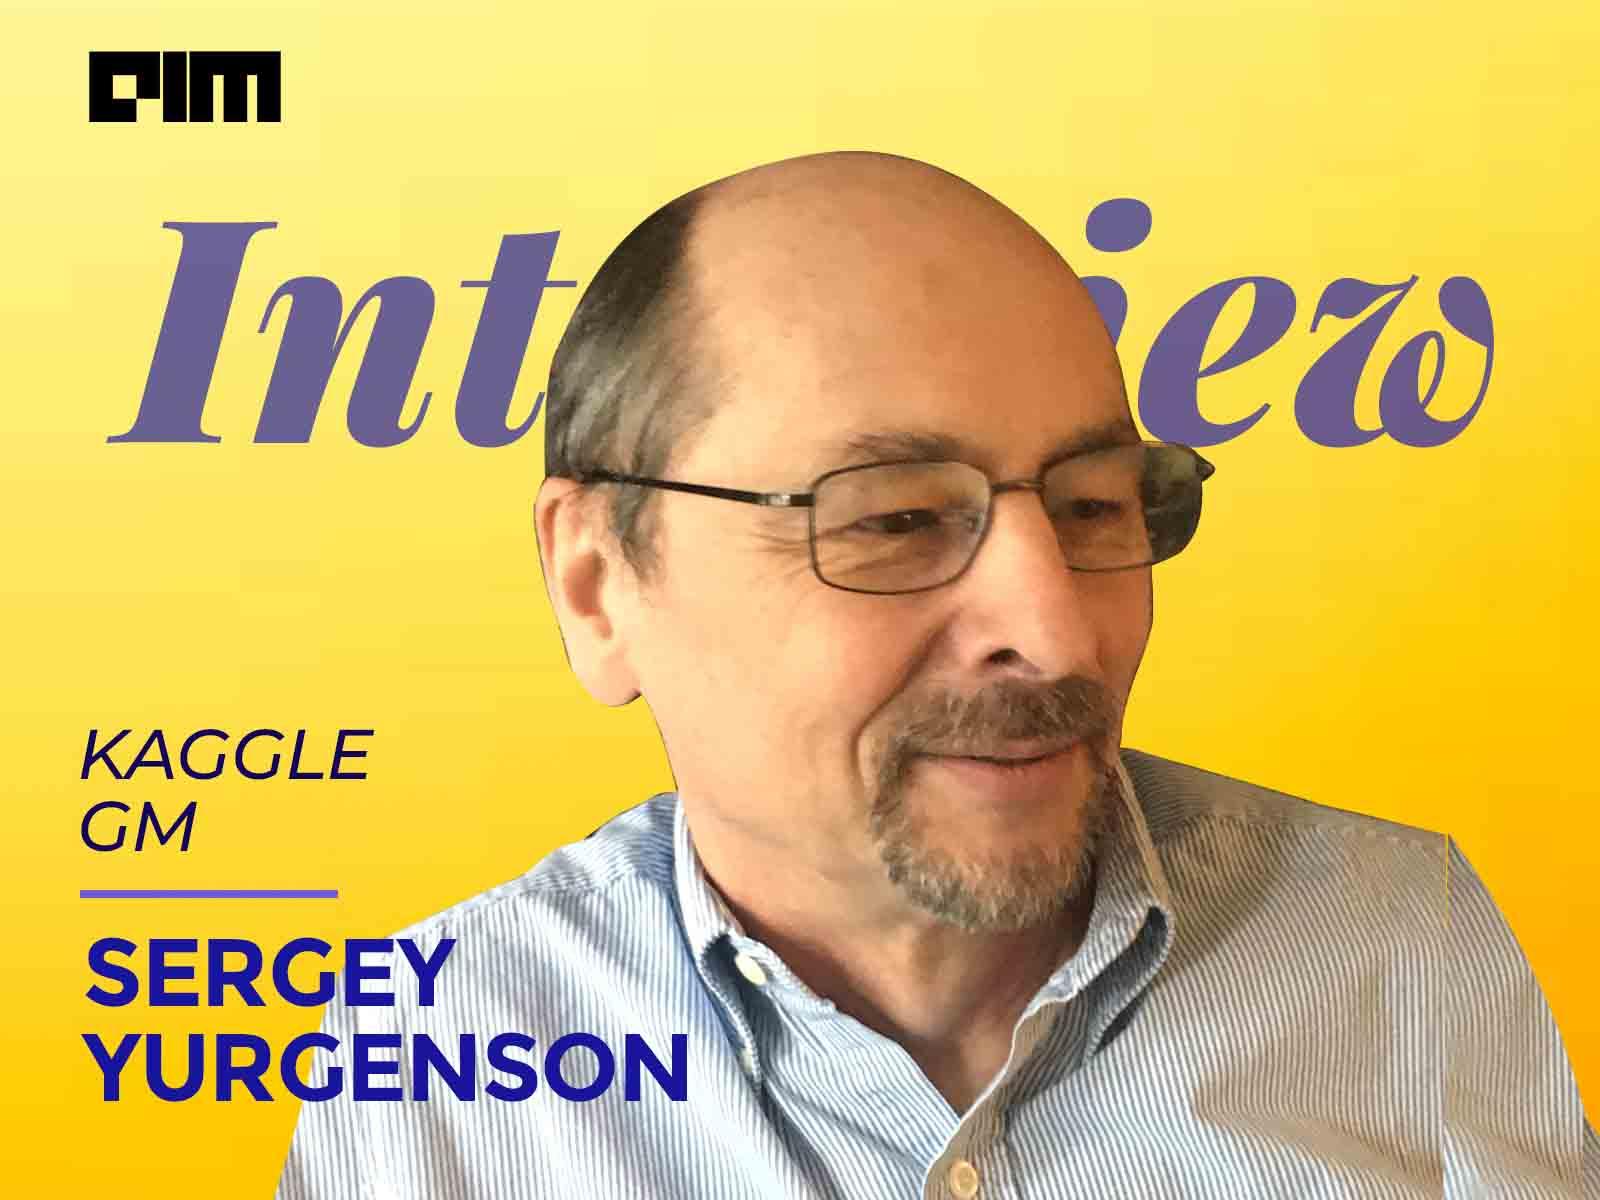 Harvard NeuroBiology To Data Science: Journey Of Kaggle GM Sergey Yurgenson